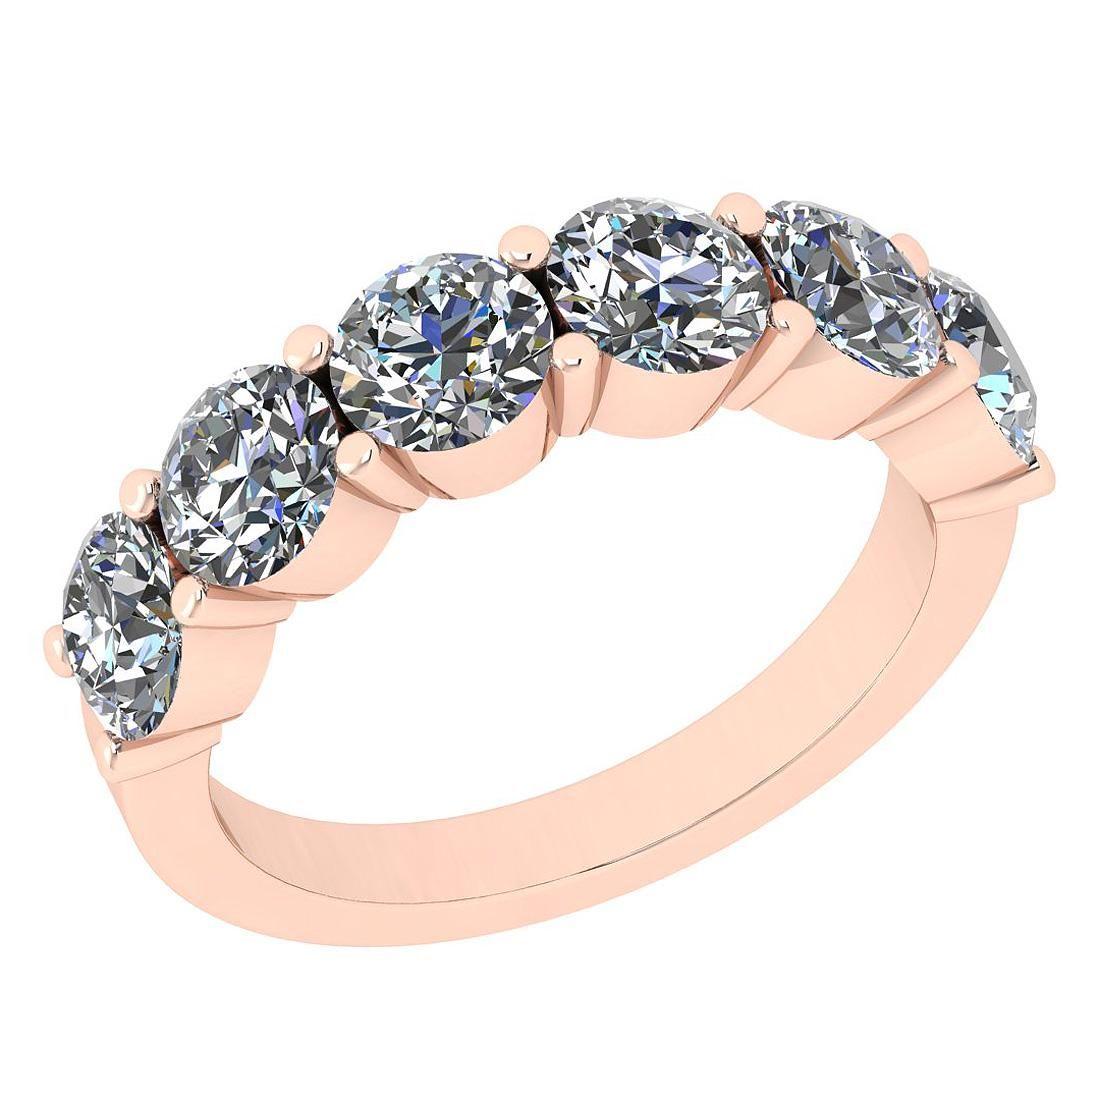 Certified 2.50 Ctw SI2/I1 Diamond 14K Rose Gold Eternit